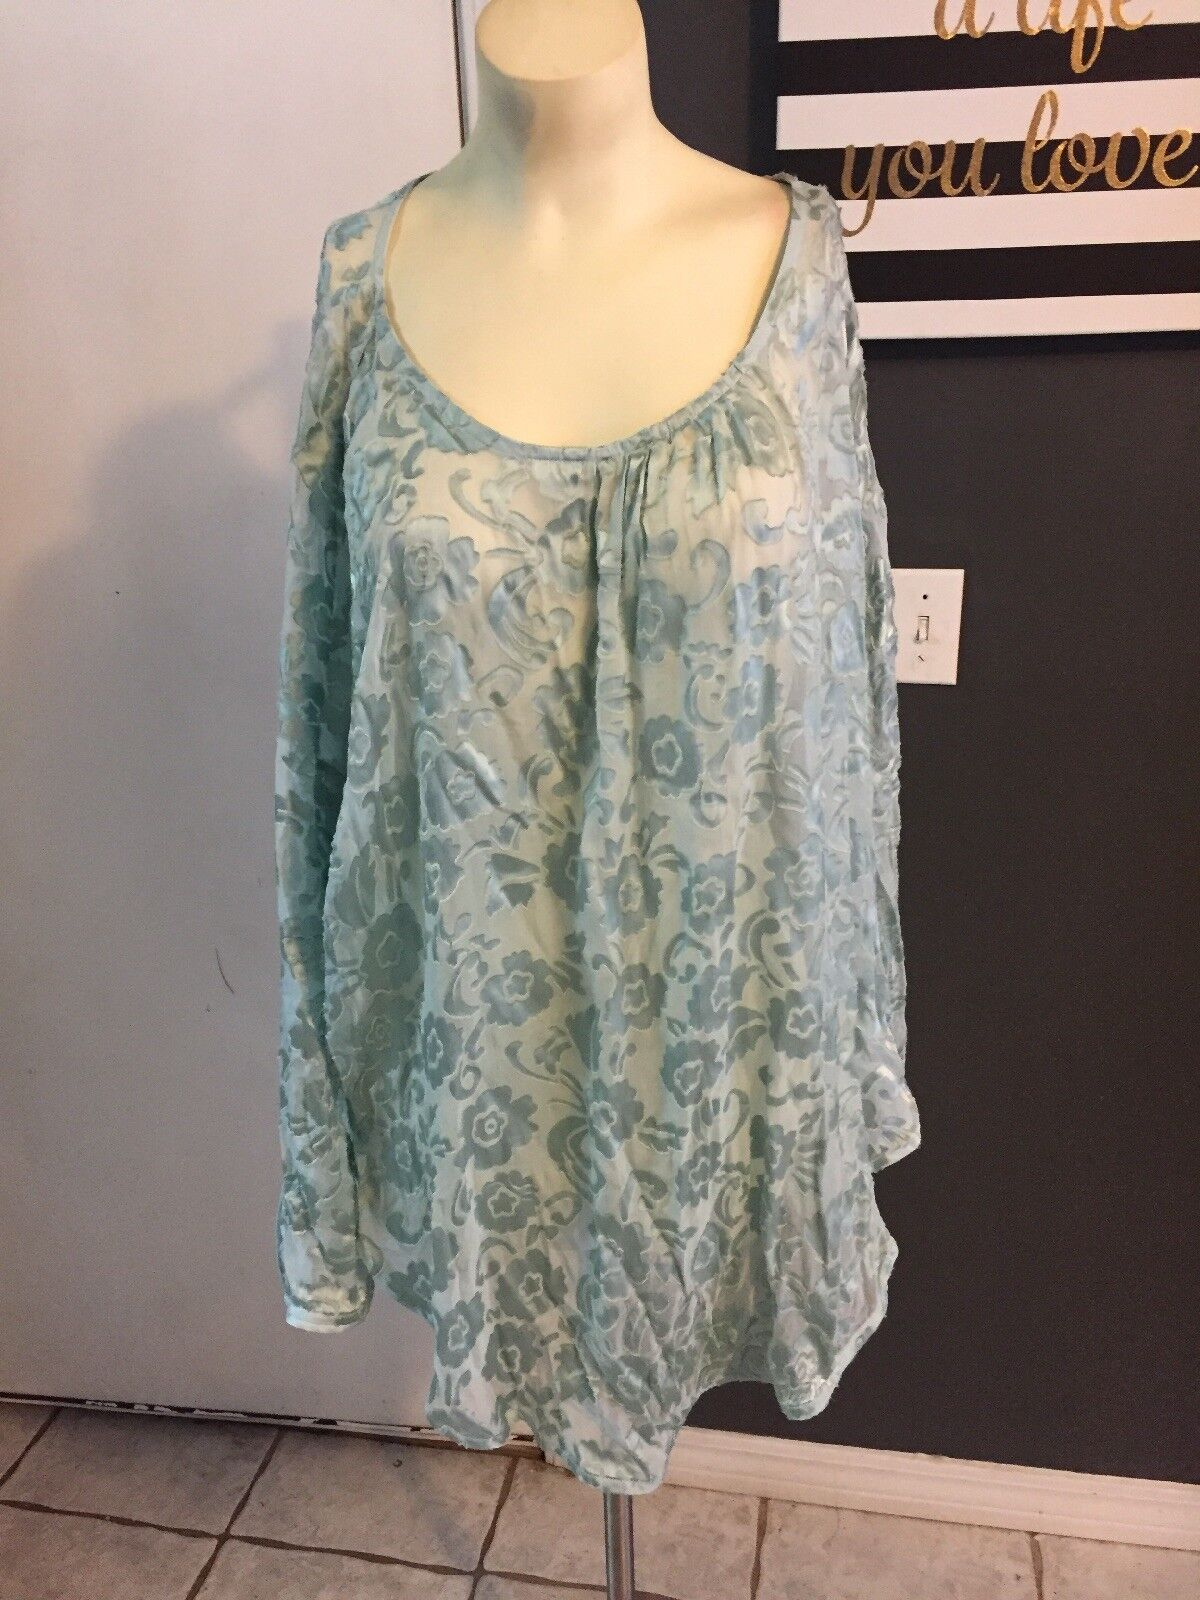 Calypso Light Grün Semi Sheer Blouse Cover Up Silk Blend Größe M OverGrößed